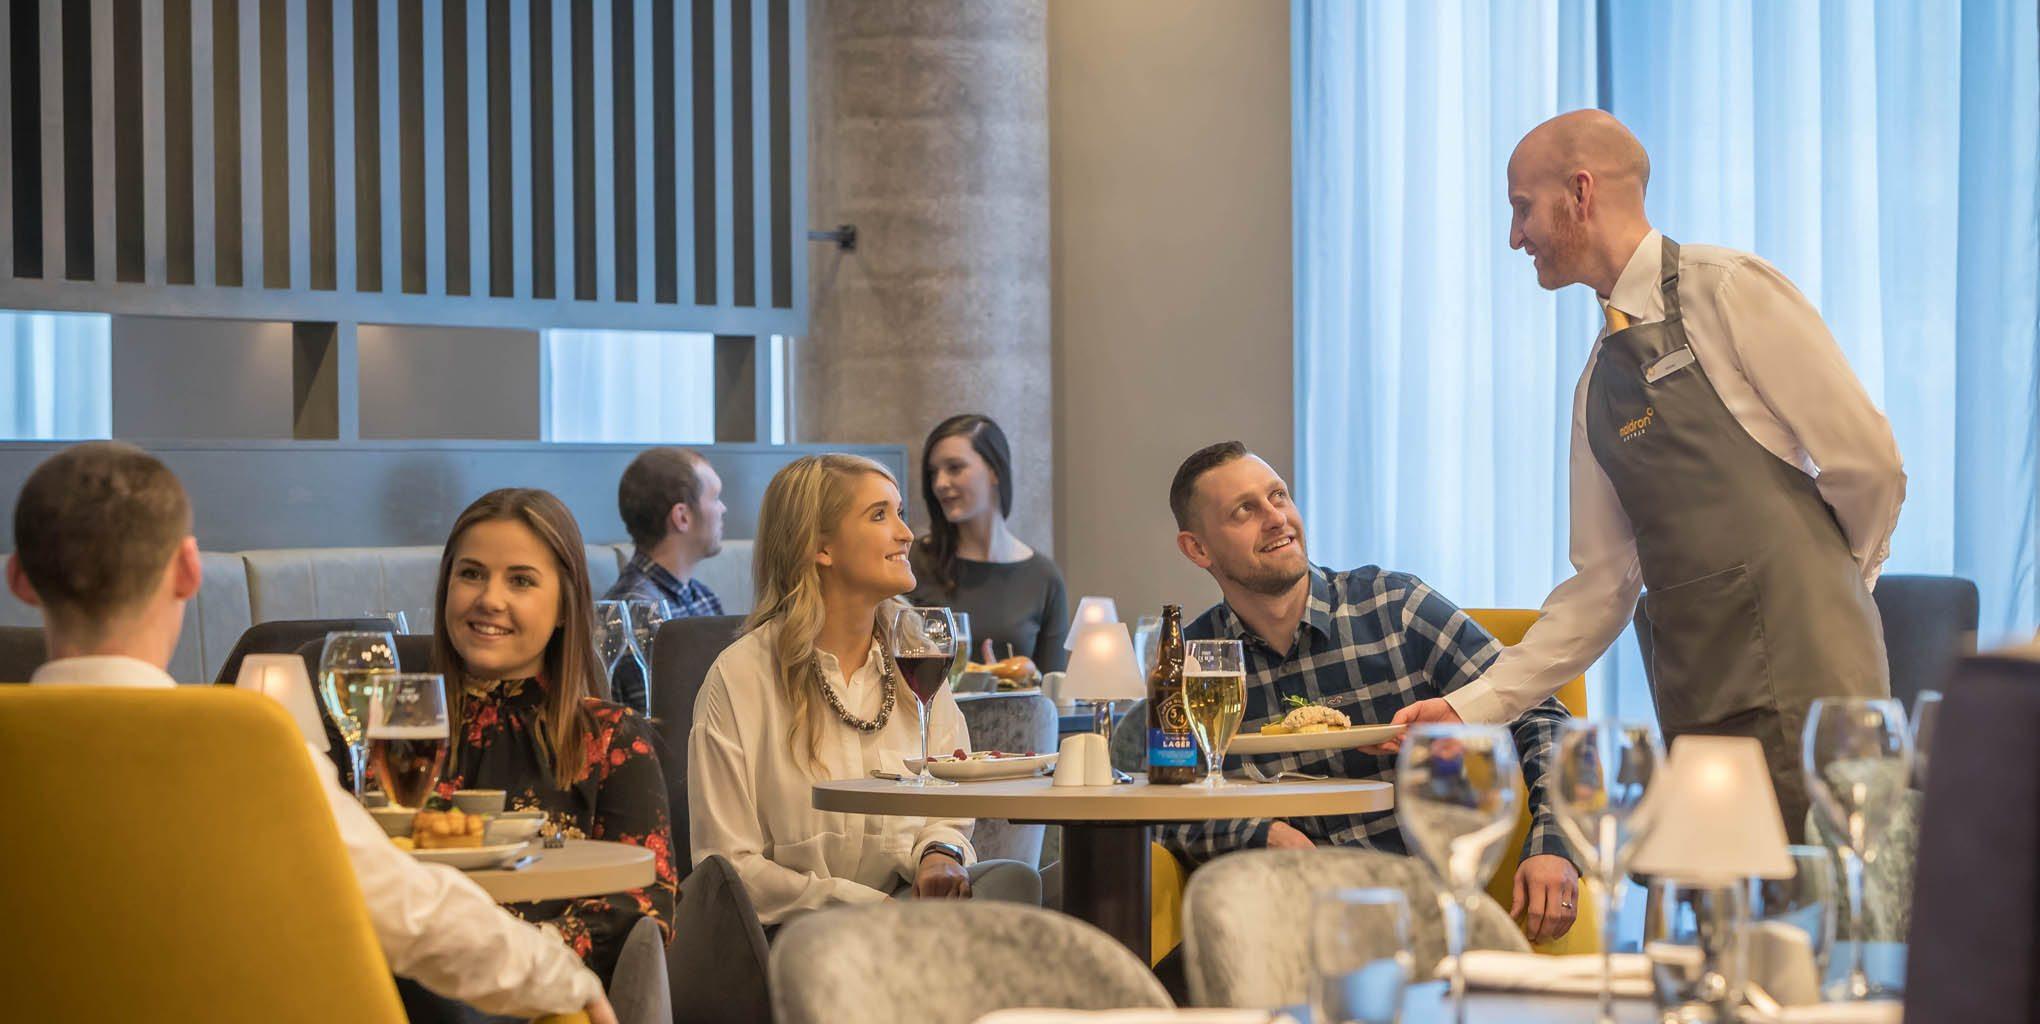 speed dating belfast nordirland skriver stor online dating profil